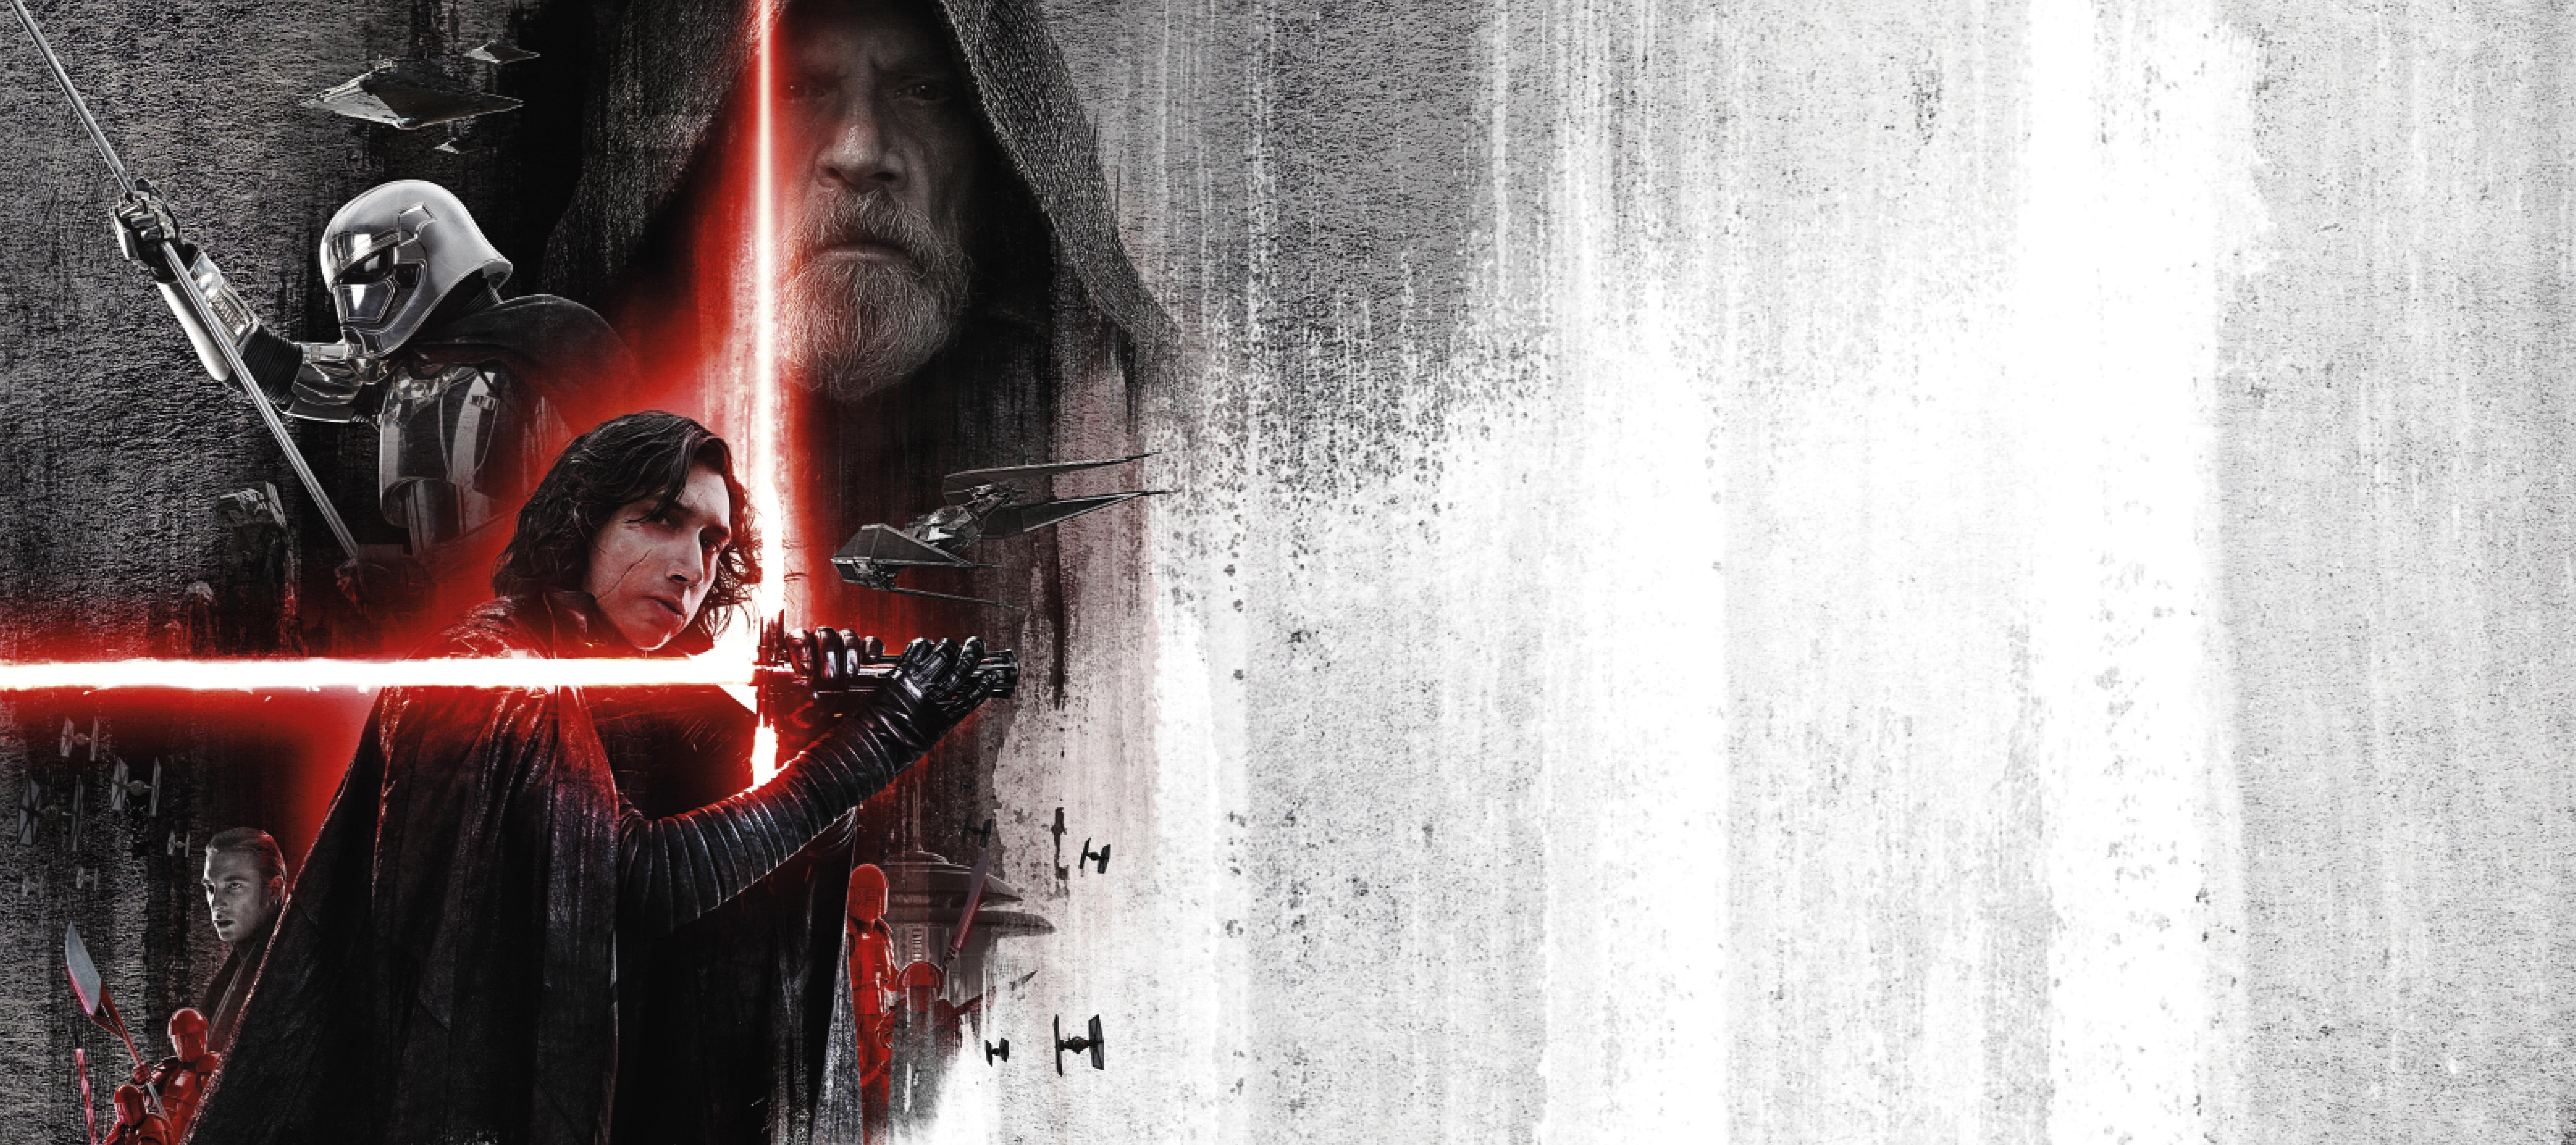 Star Wars The Last Jedi Lightsaber Movie Poster 8k Wallpaper Best Wallpapers